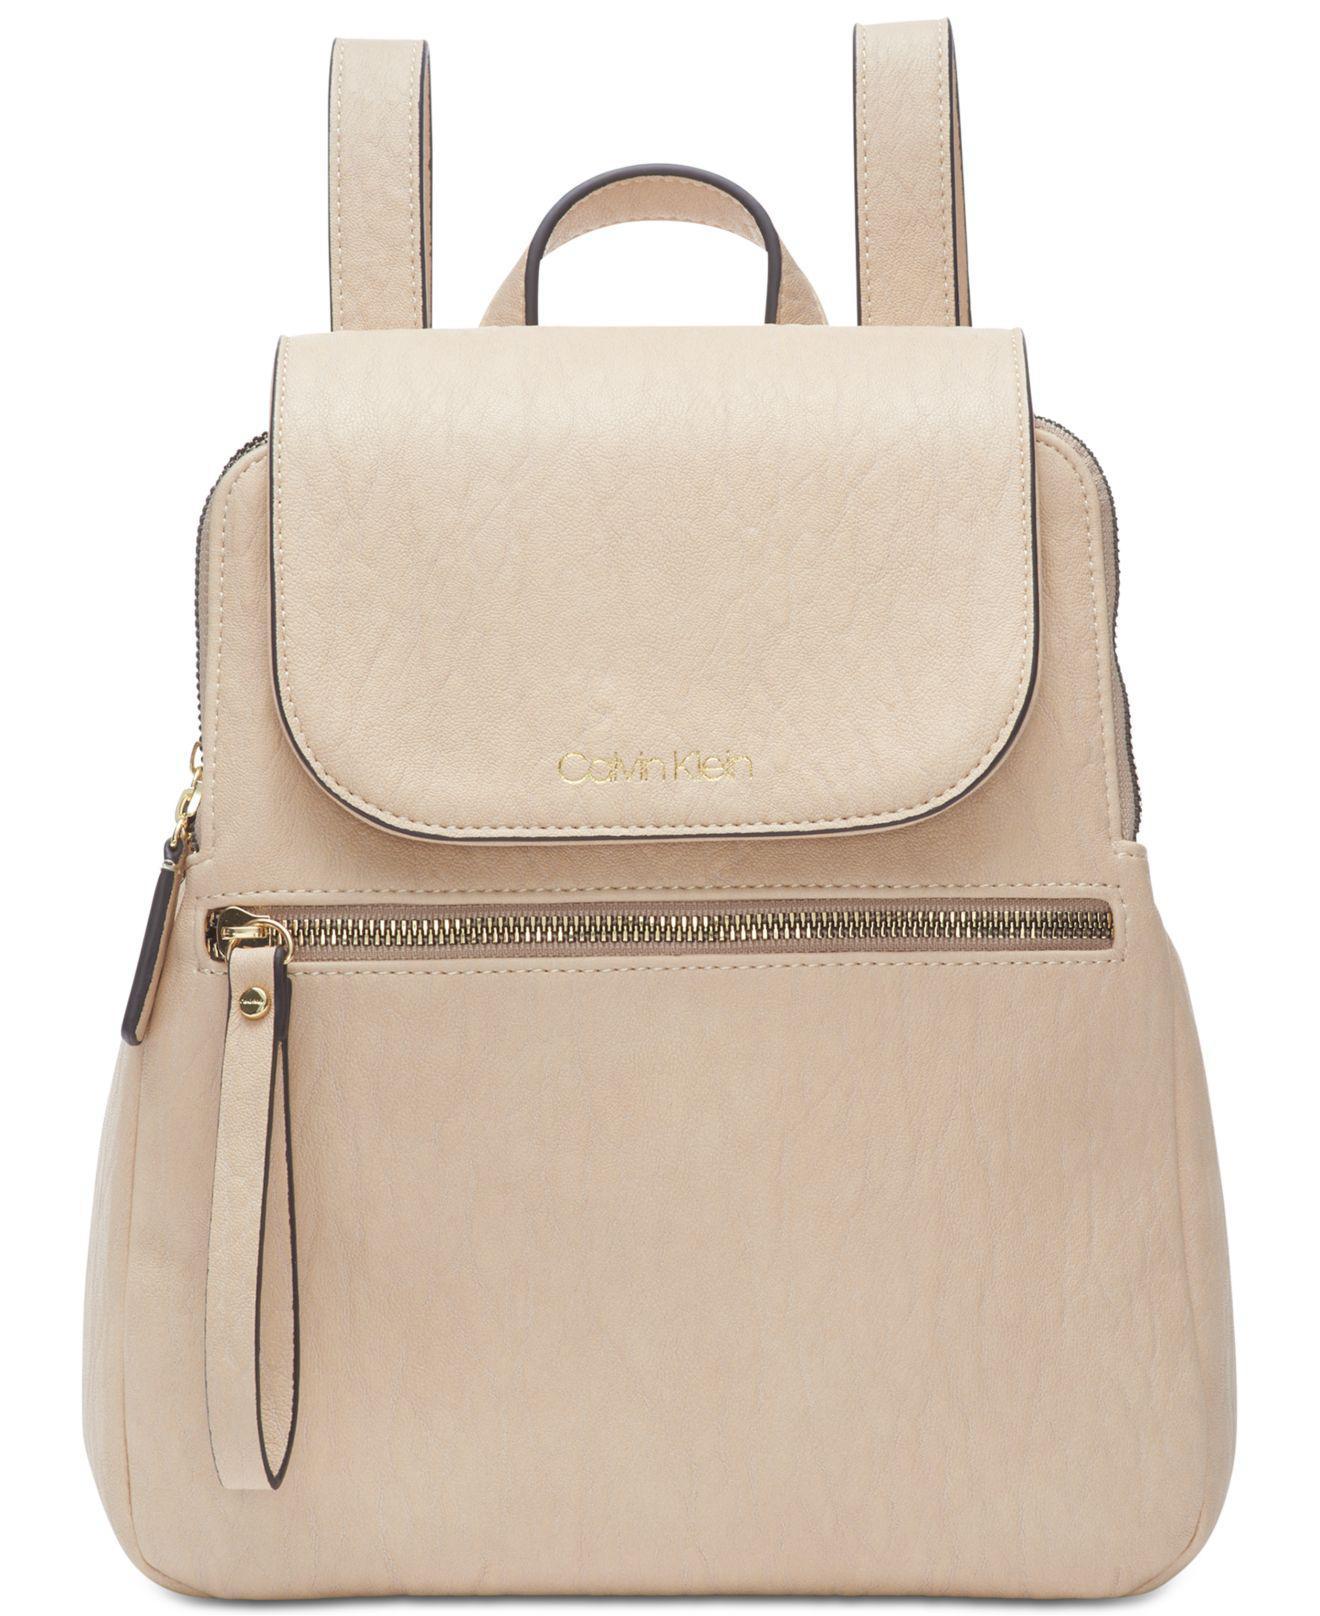 67e46d999a6b Calvin Klein. Women s Elaine Flap Backpack